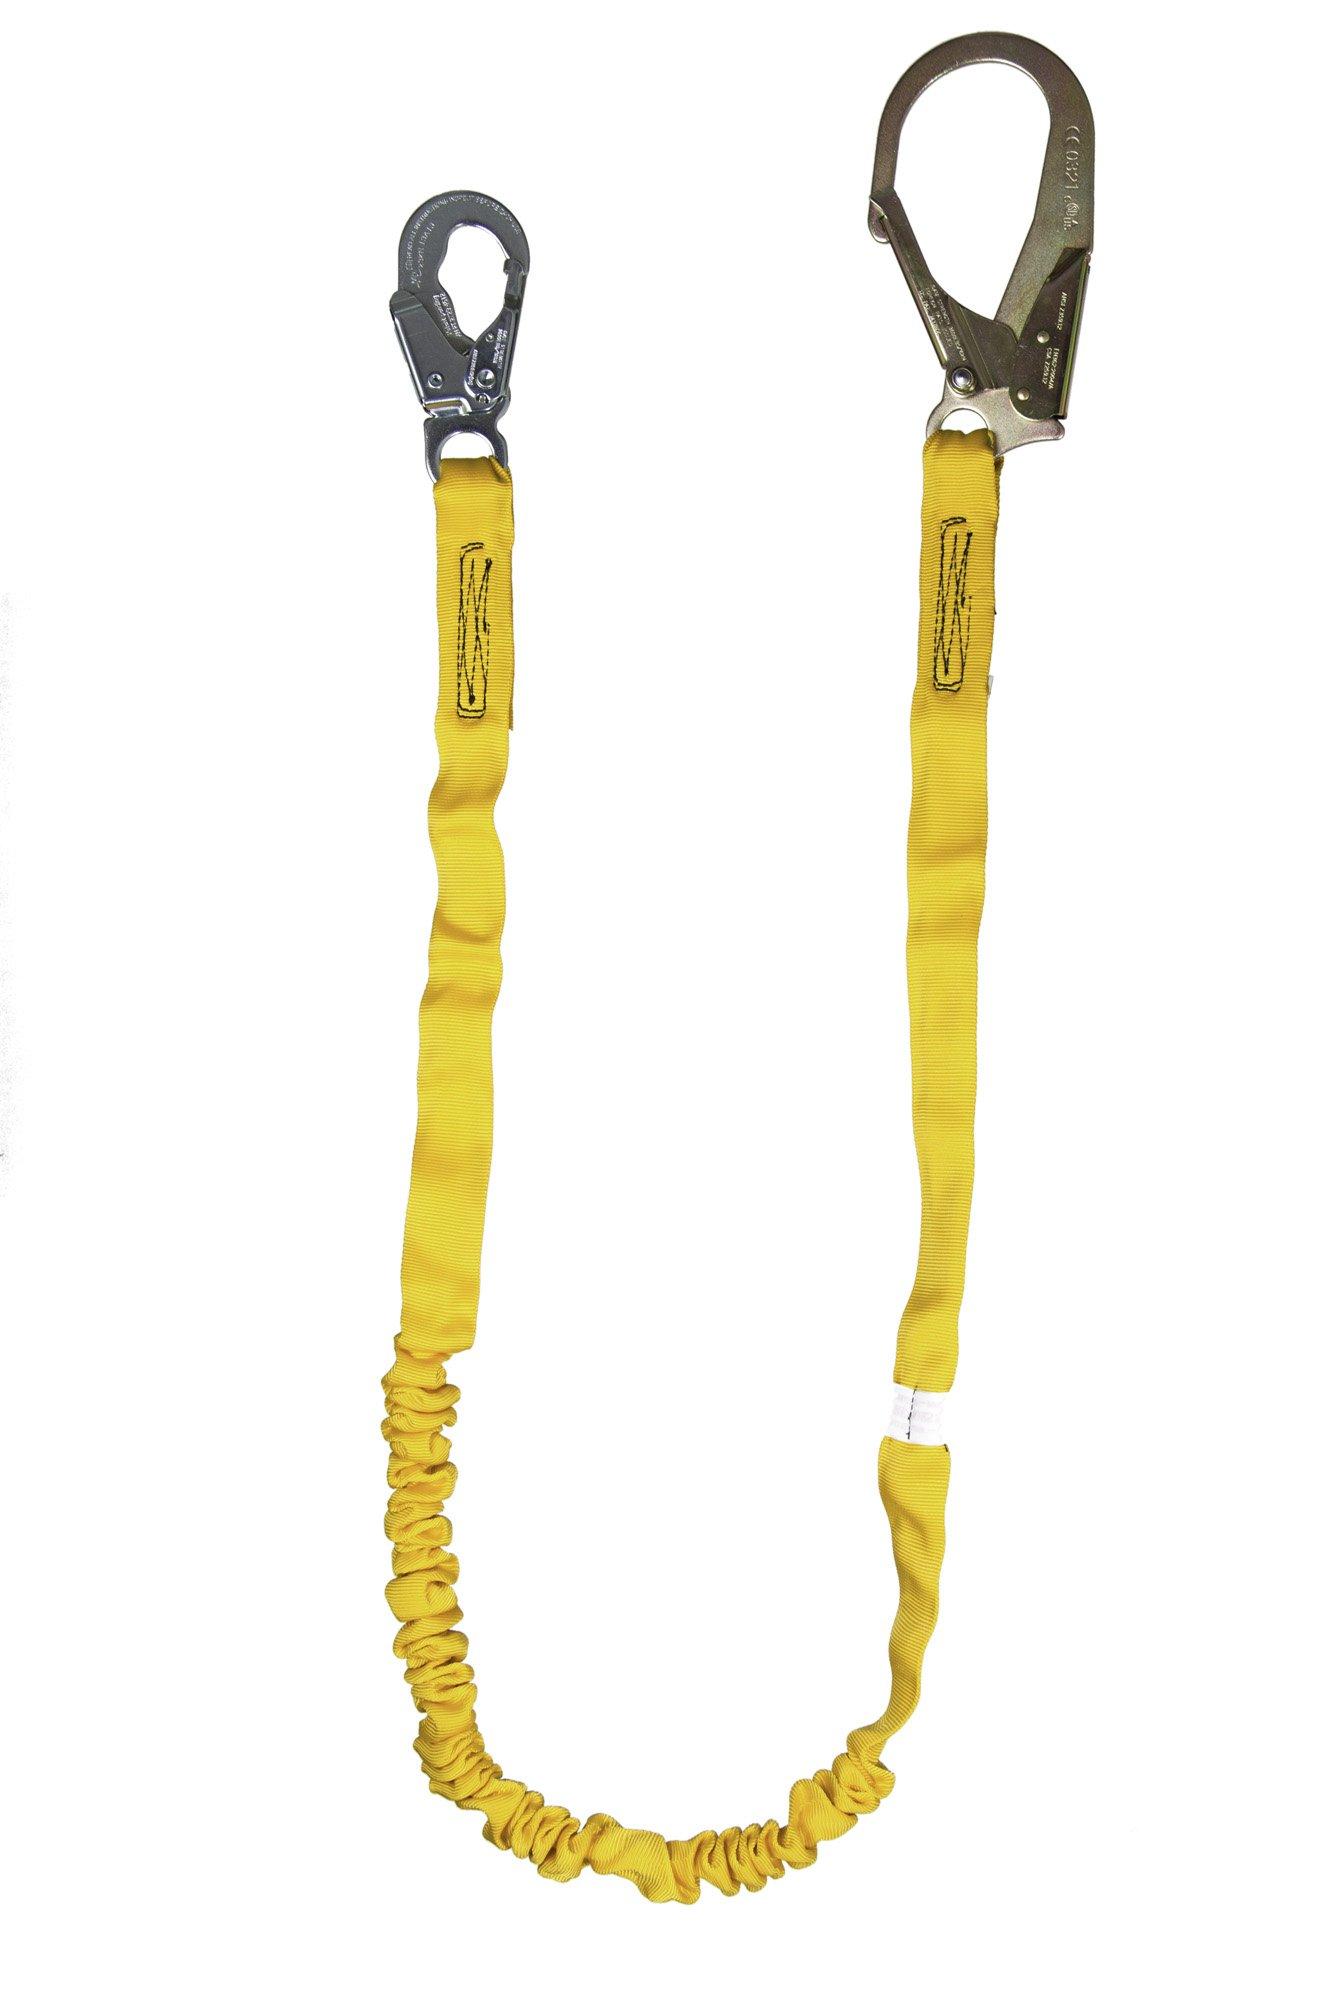 Guardian Fall Protection 11201 IS-72R 6-Foot Internal Shock Lanyard with Rebar Hook